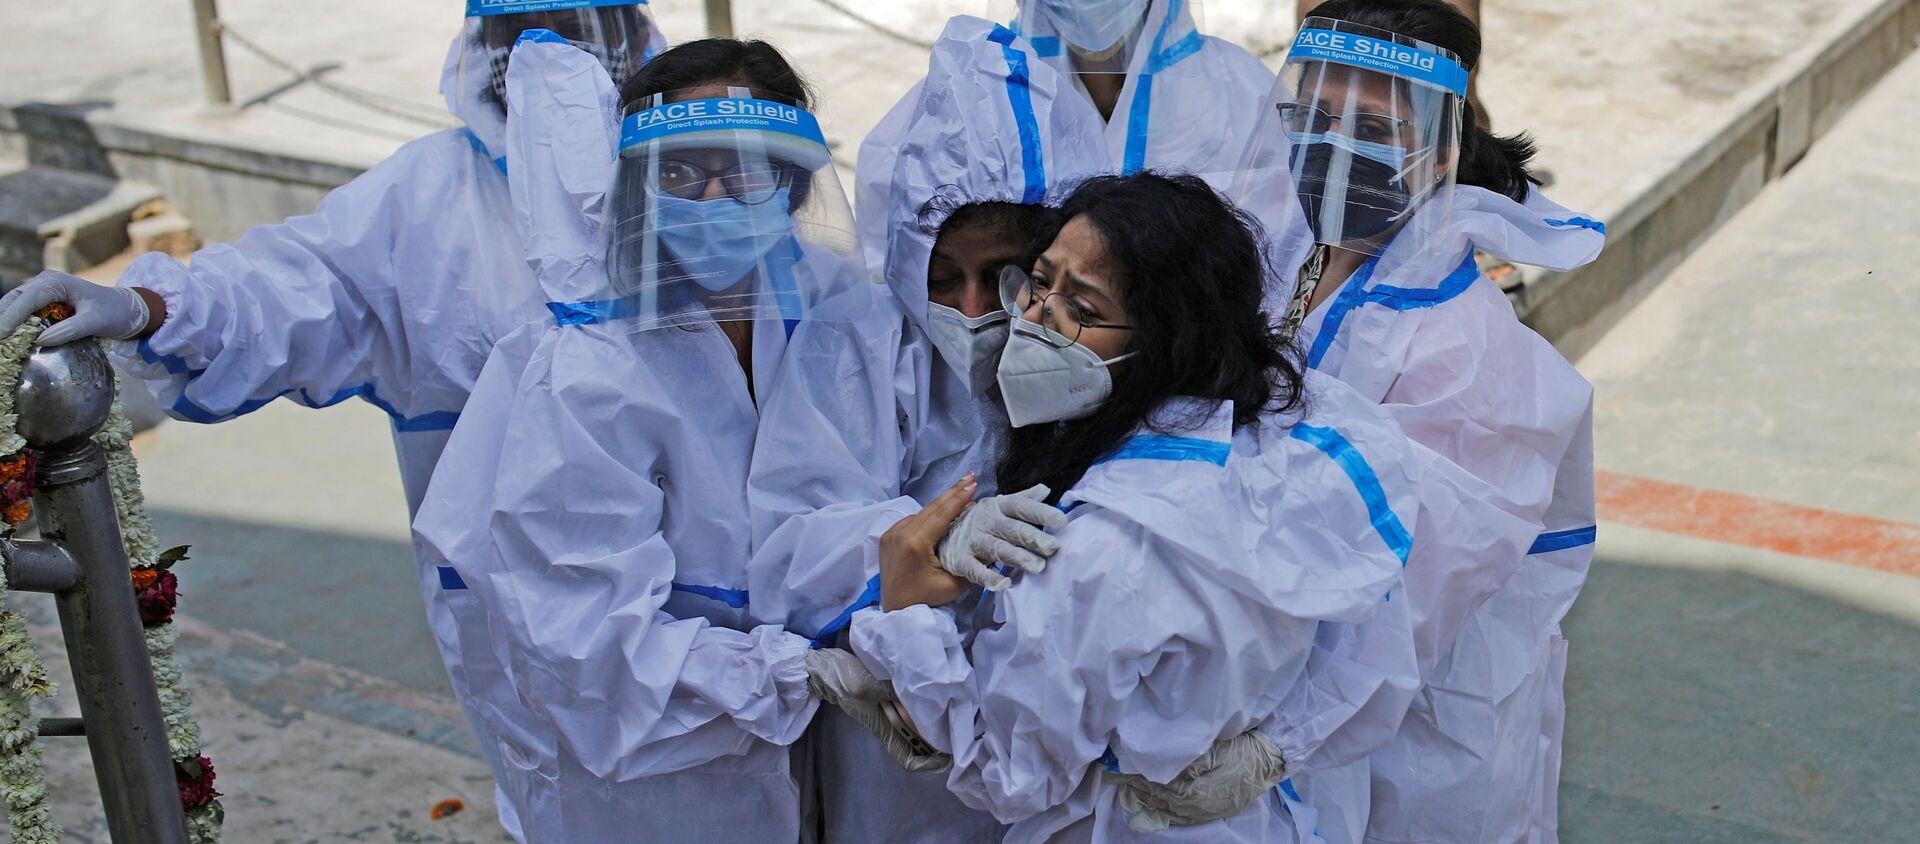 Pandemia koronawirusa SARS-CoV-2. New Delhi, Indie. - Sputnik Polska, 1920, 04.05.2021